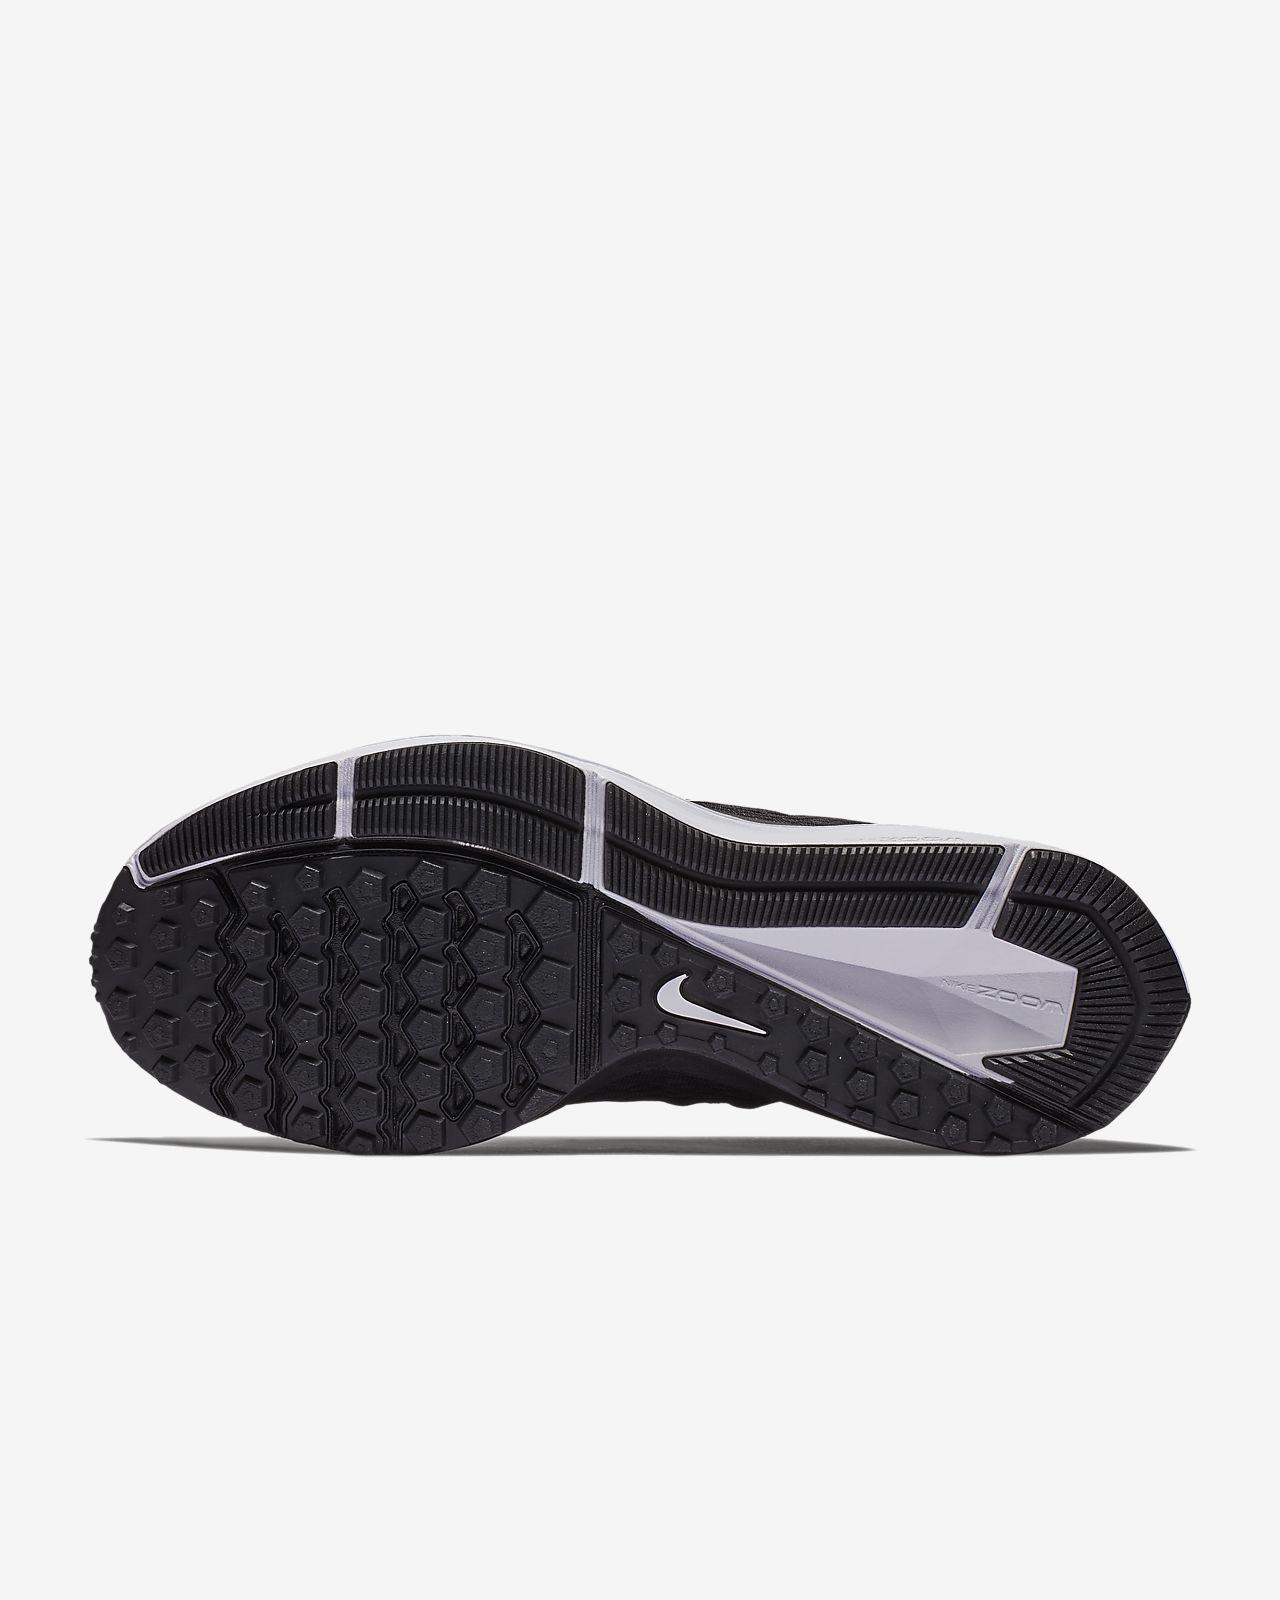 new style 2382e be16e ... Nike Air Zoom Winflo 5 Men s Running Shoe